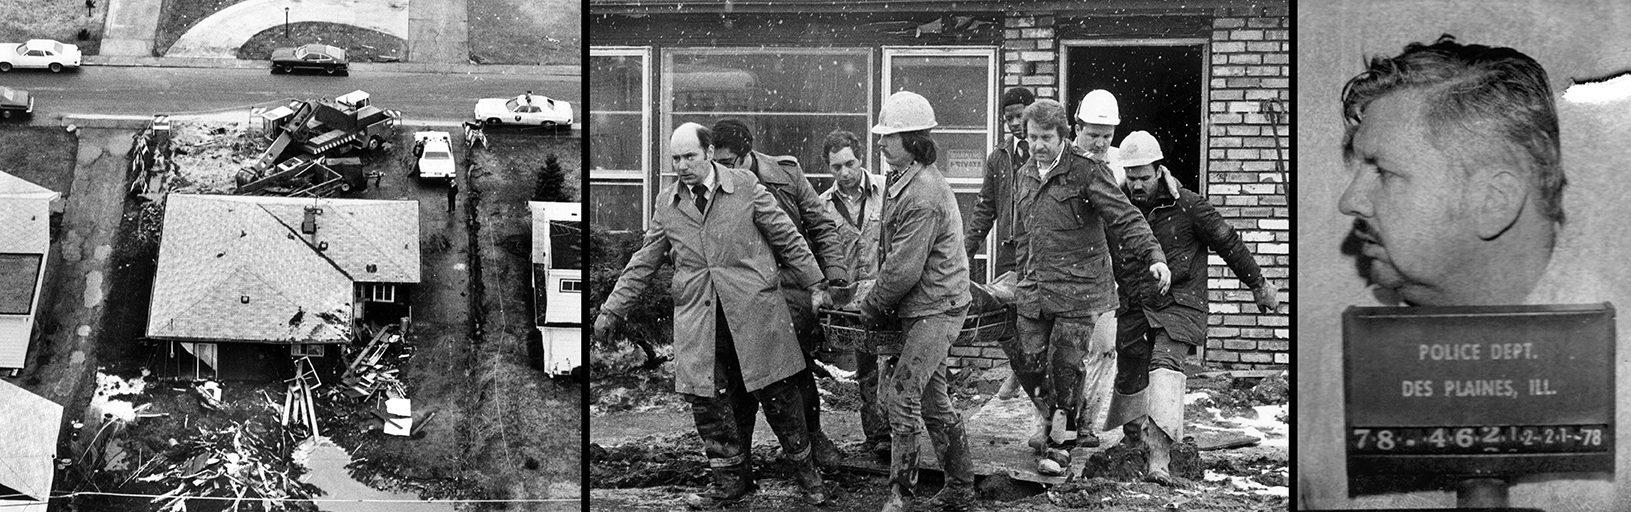 40 years later: John Wayne Gacy's killing spree shattered